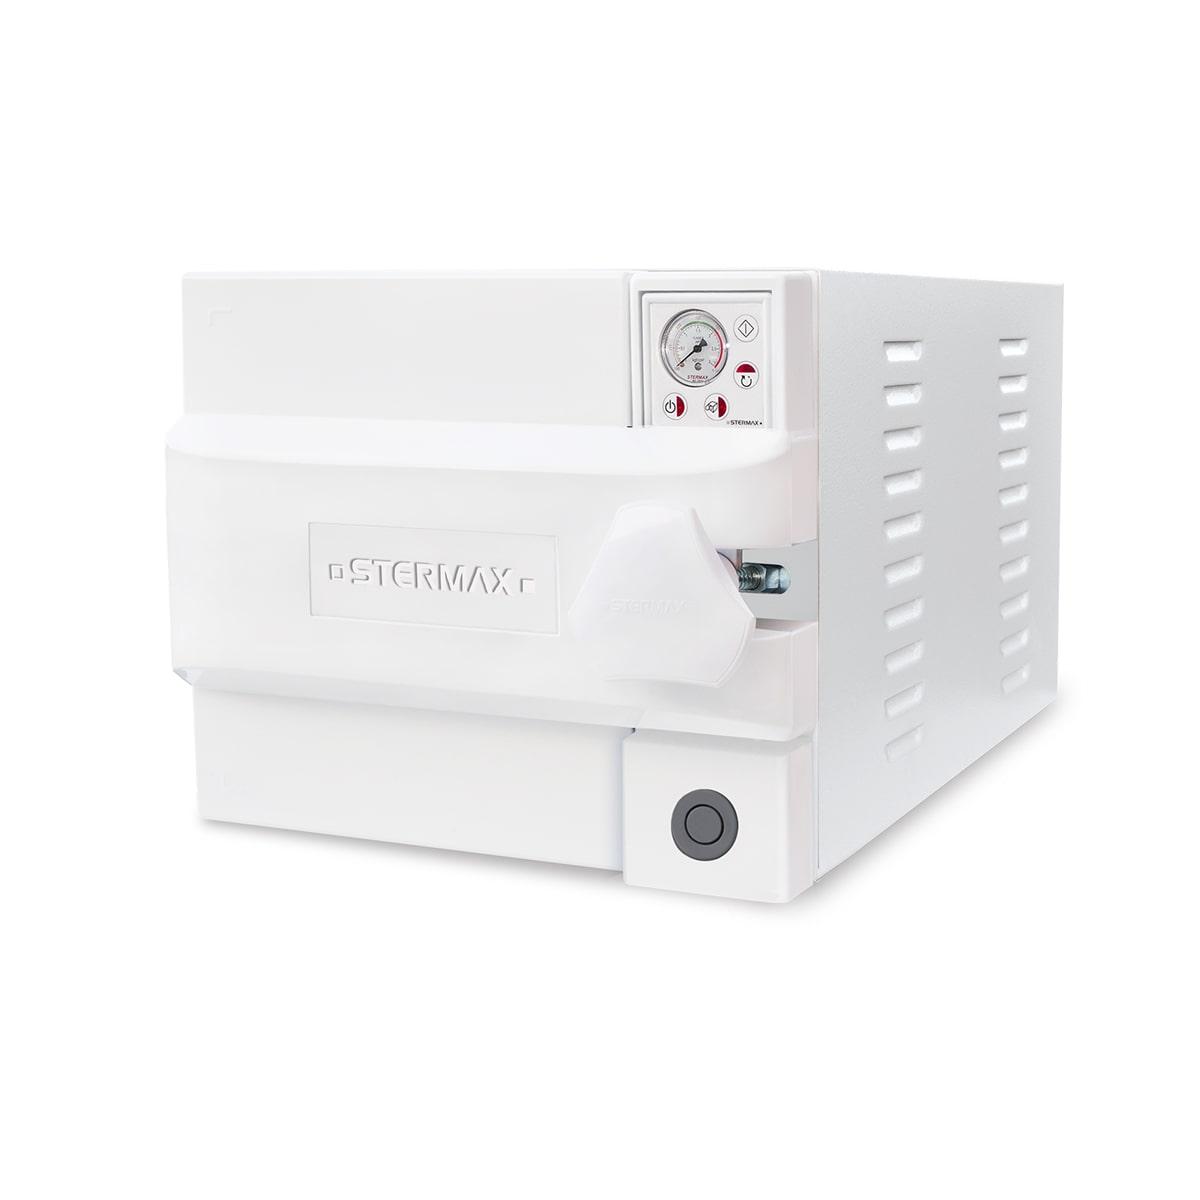 Autoclave Horizontal Analógica Gravitacional Silenciosa Box 21 litros - Stermax